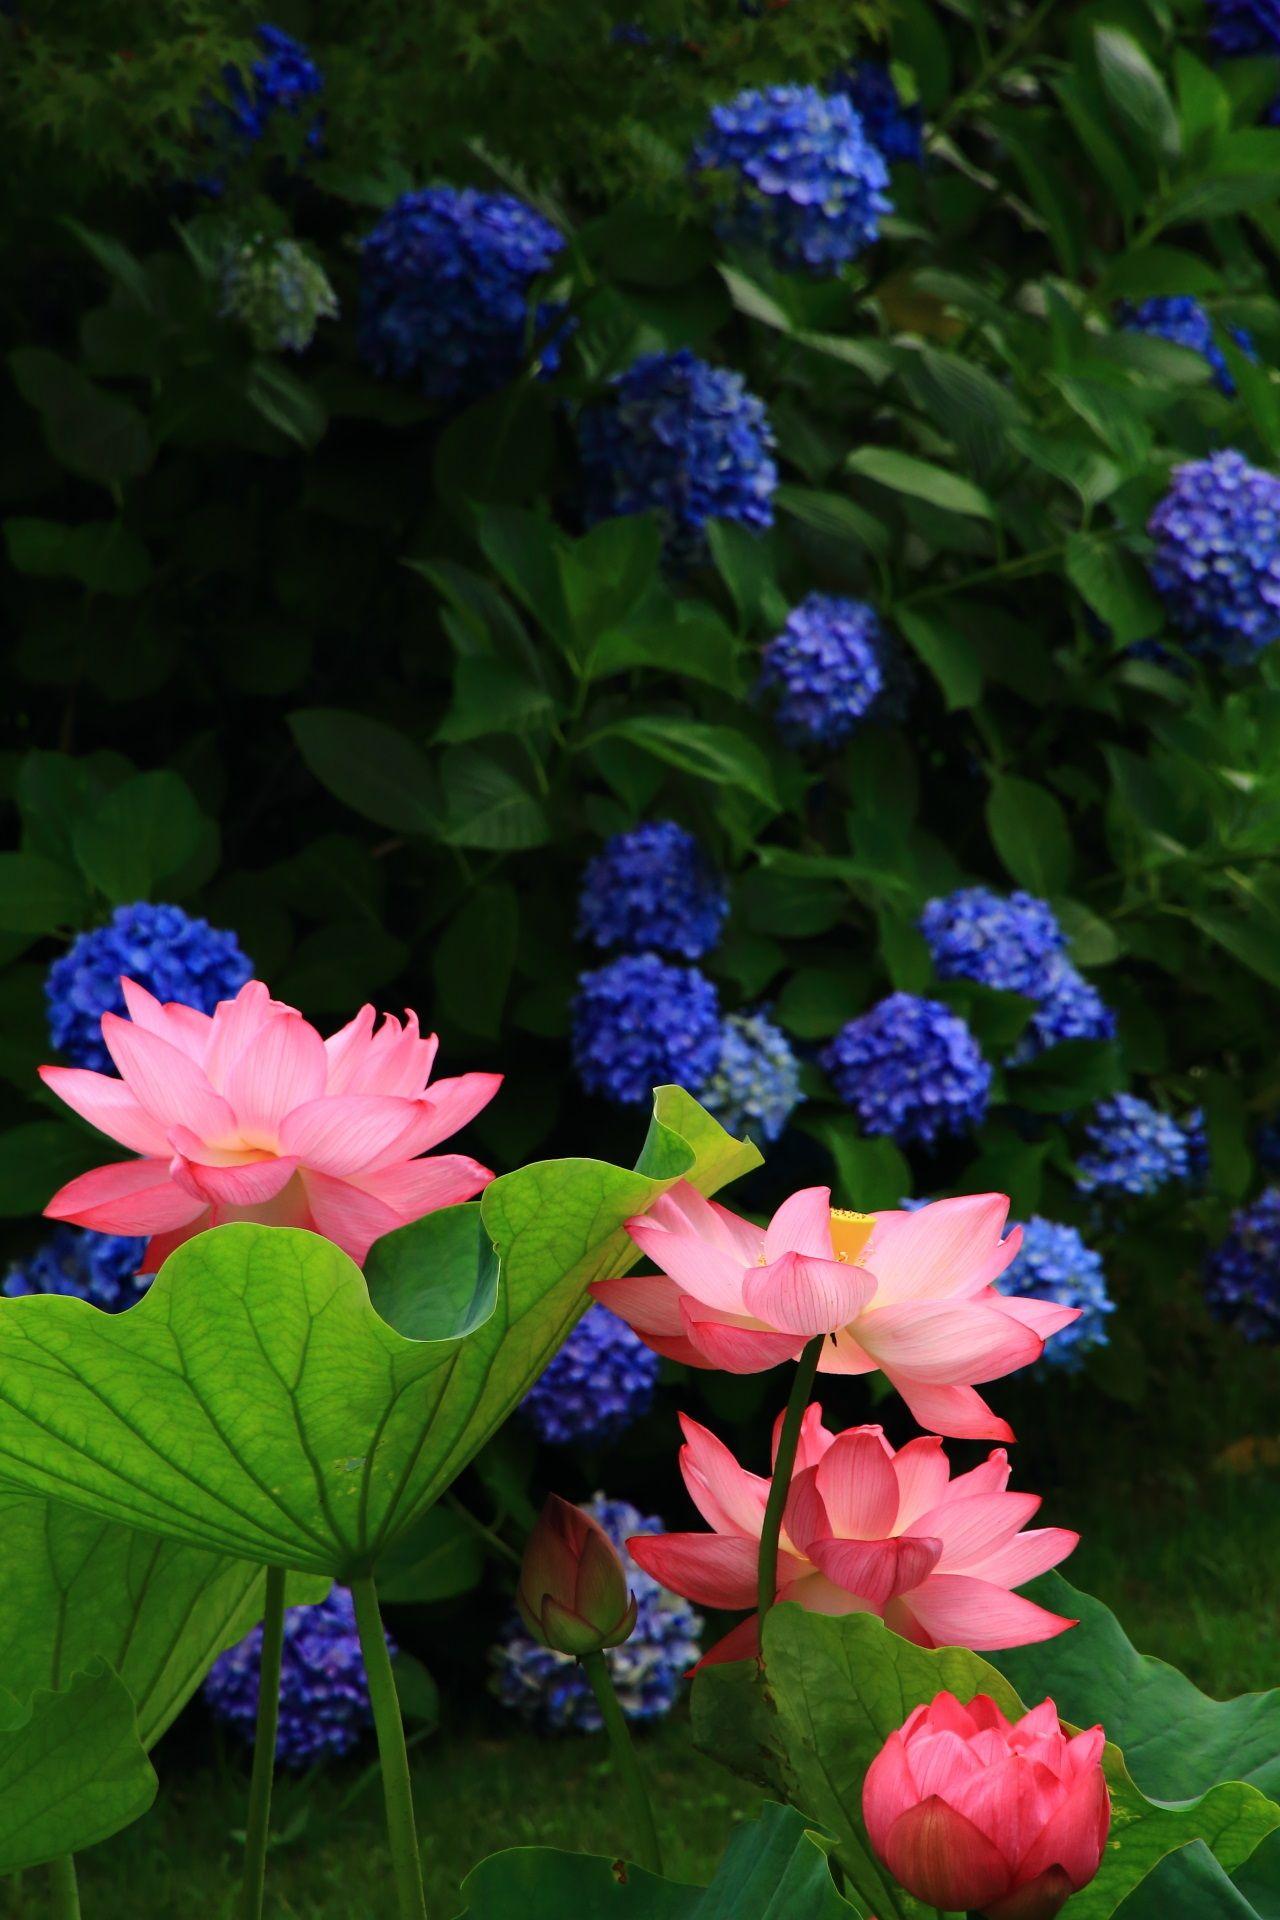 Stunning contrast of colors ltus and hydrangeas flower power stunning contrast of colors ltus and hydrangeas lotus flowerstropical izmirmasajfo